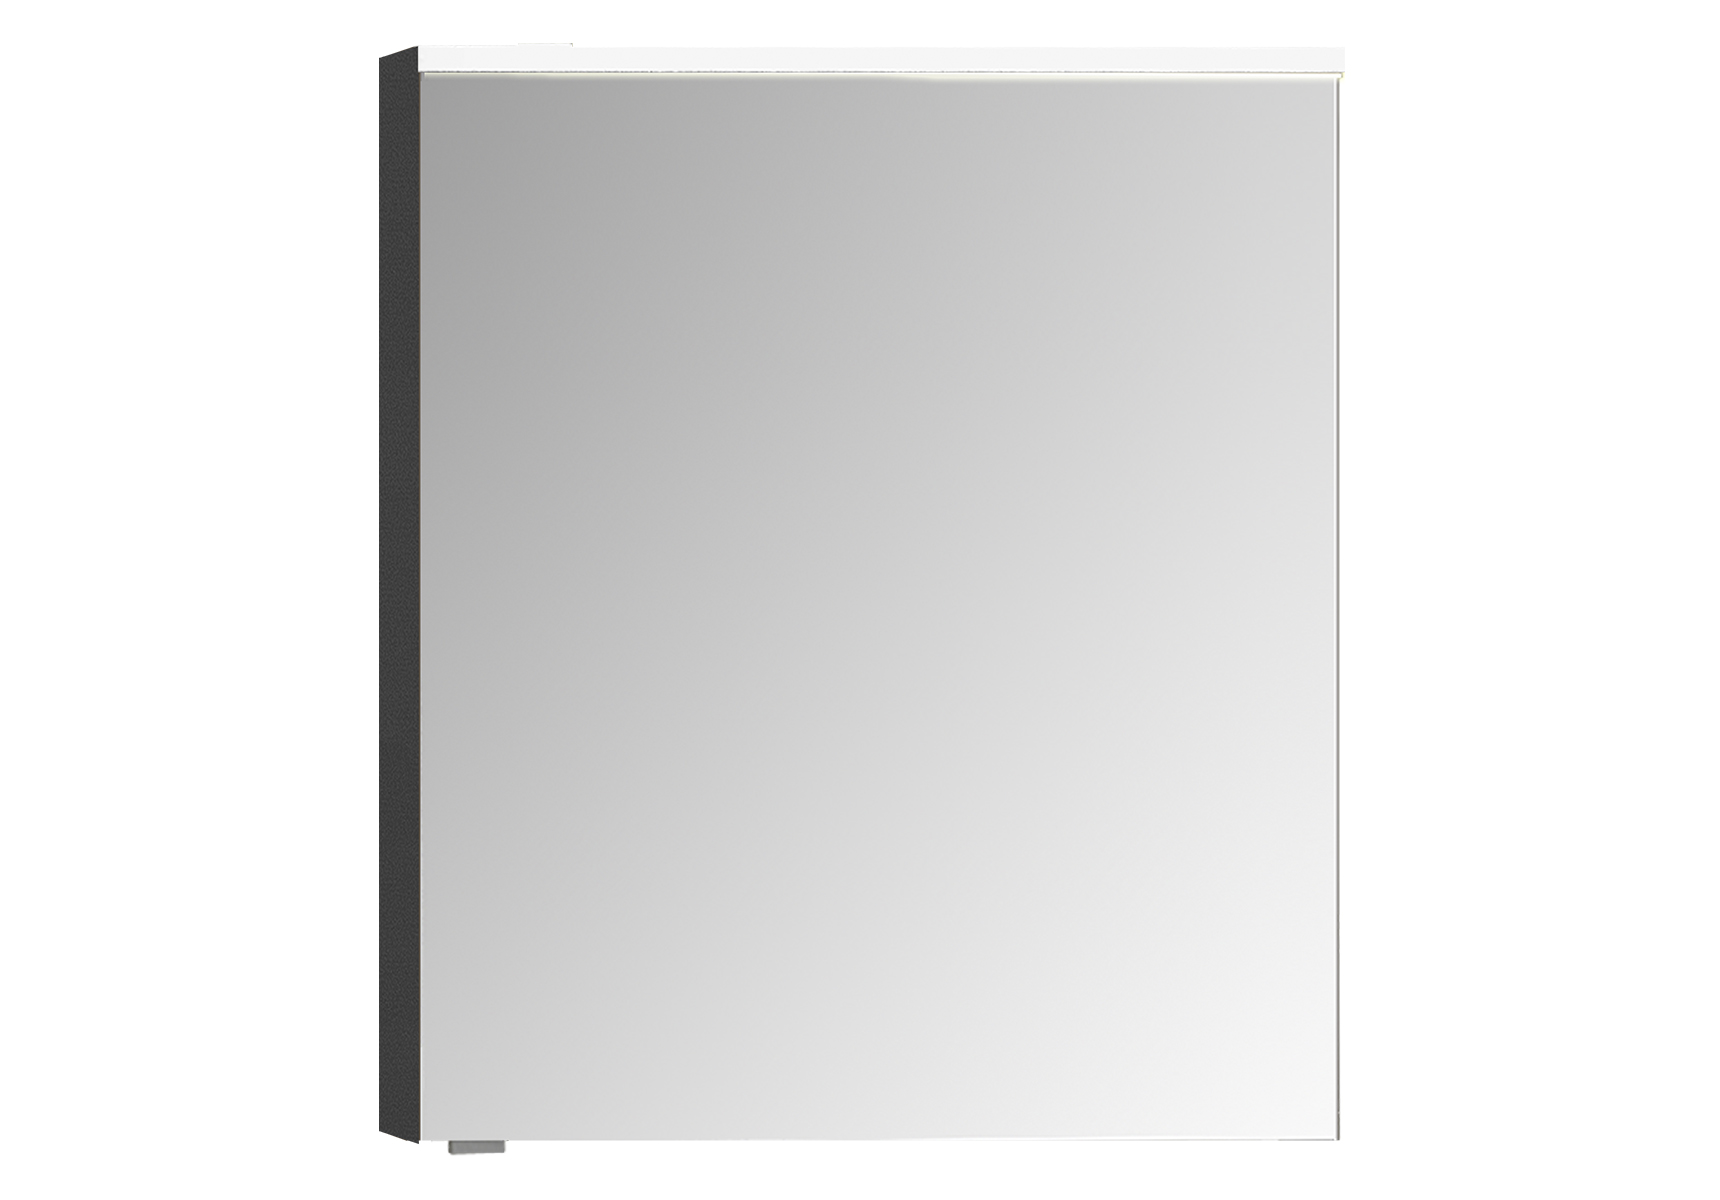 Integra Premium armoire de toilette, 60 cm, éclairage LED horizontale, anthraciteacite haute brilliance, droite